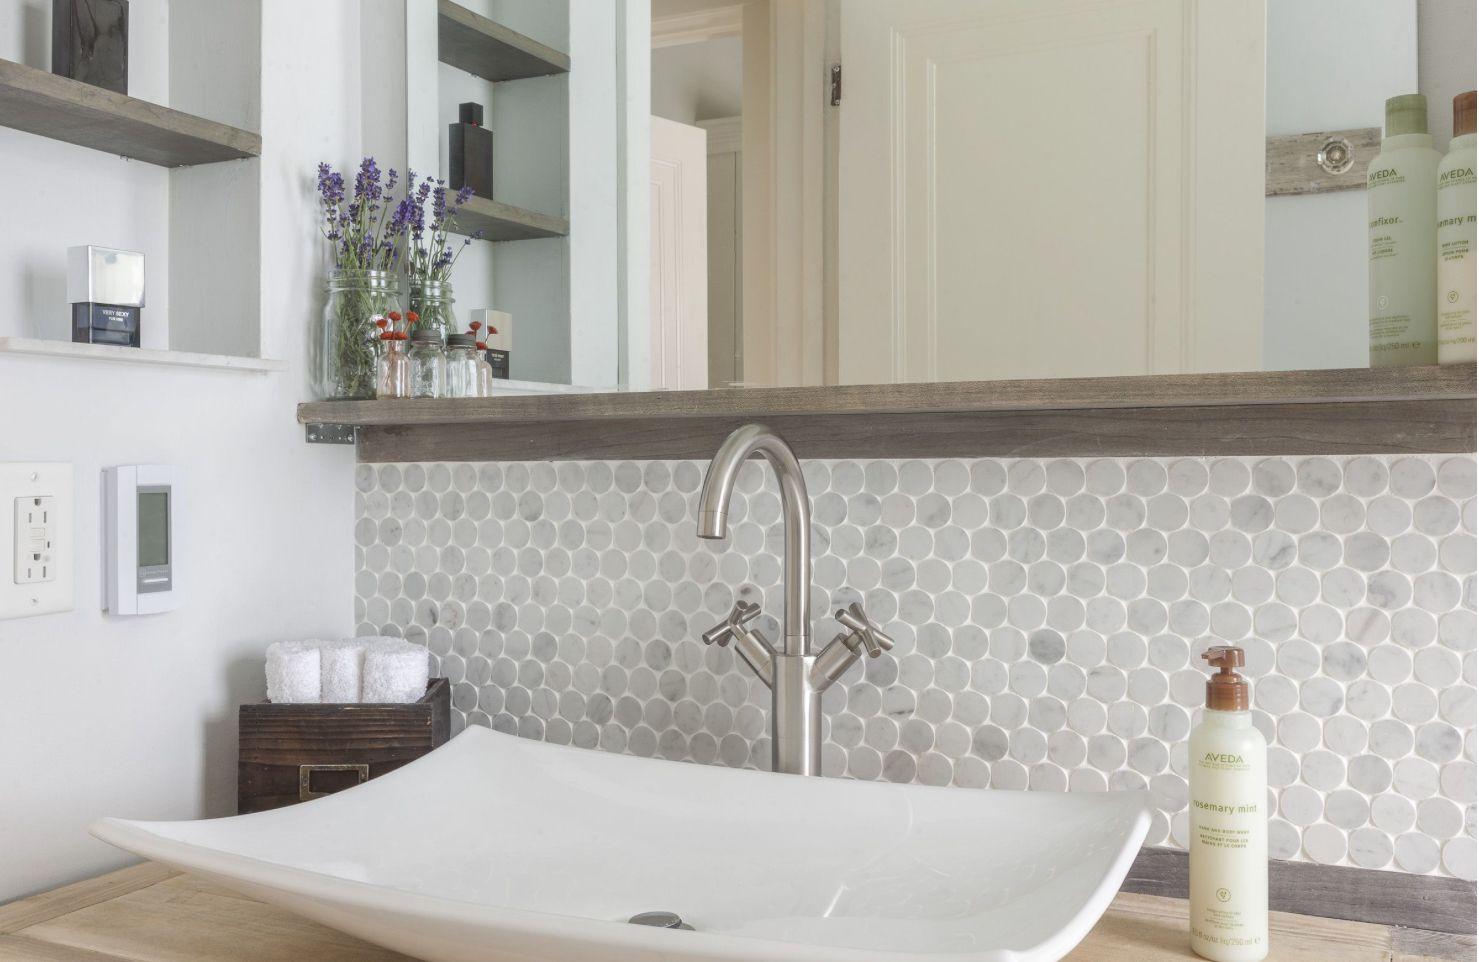 The Tile Shop Page Not Found Glass Mosaic Backsplash Farmhouse Backsplash Backsplash